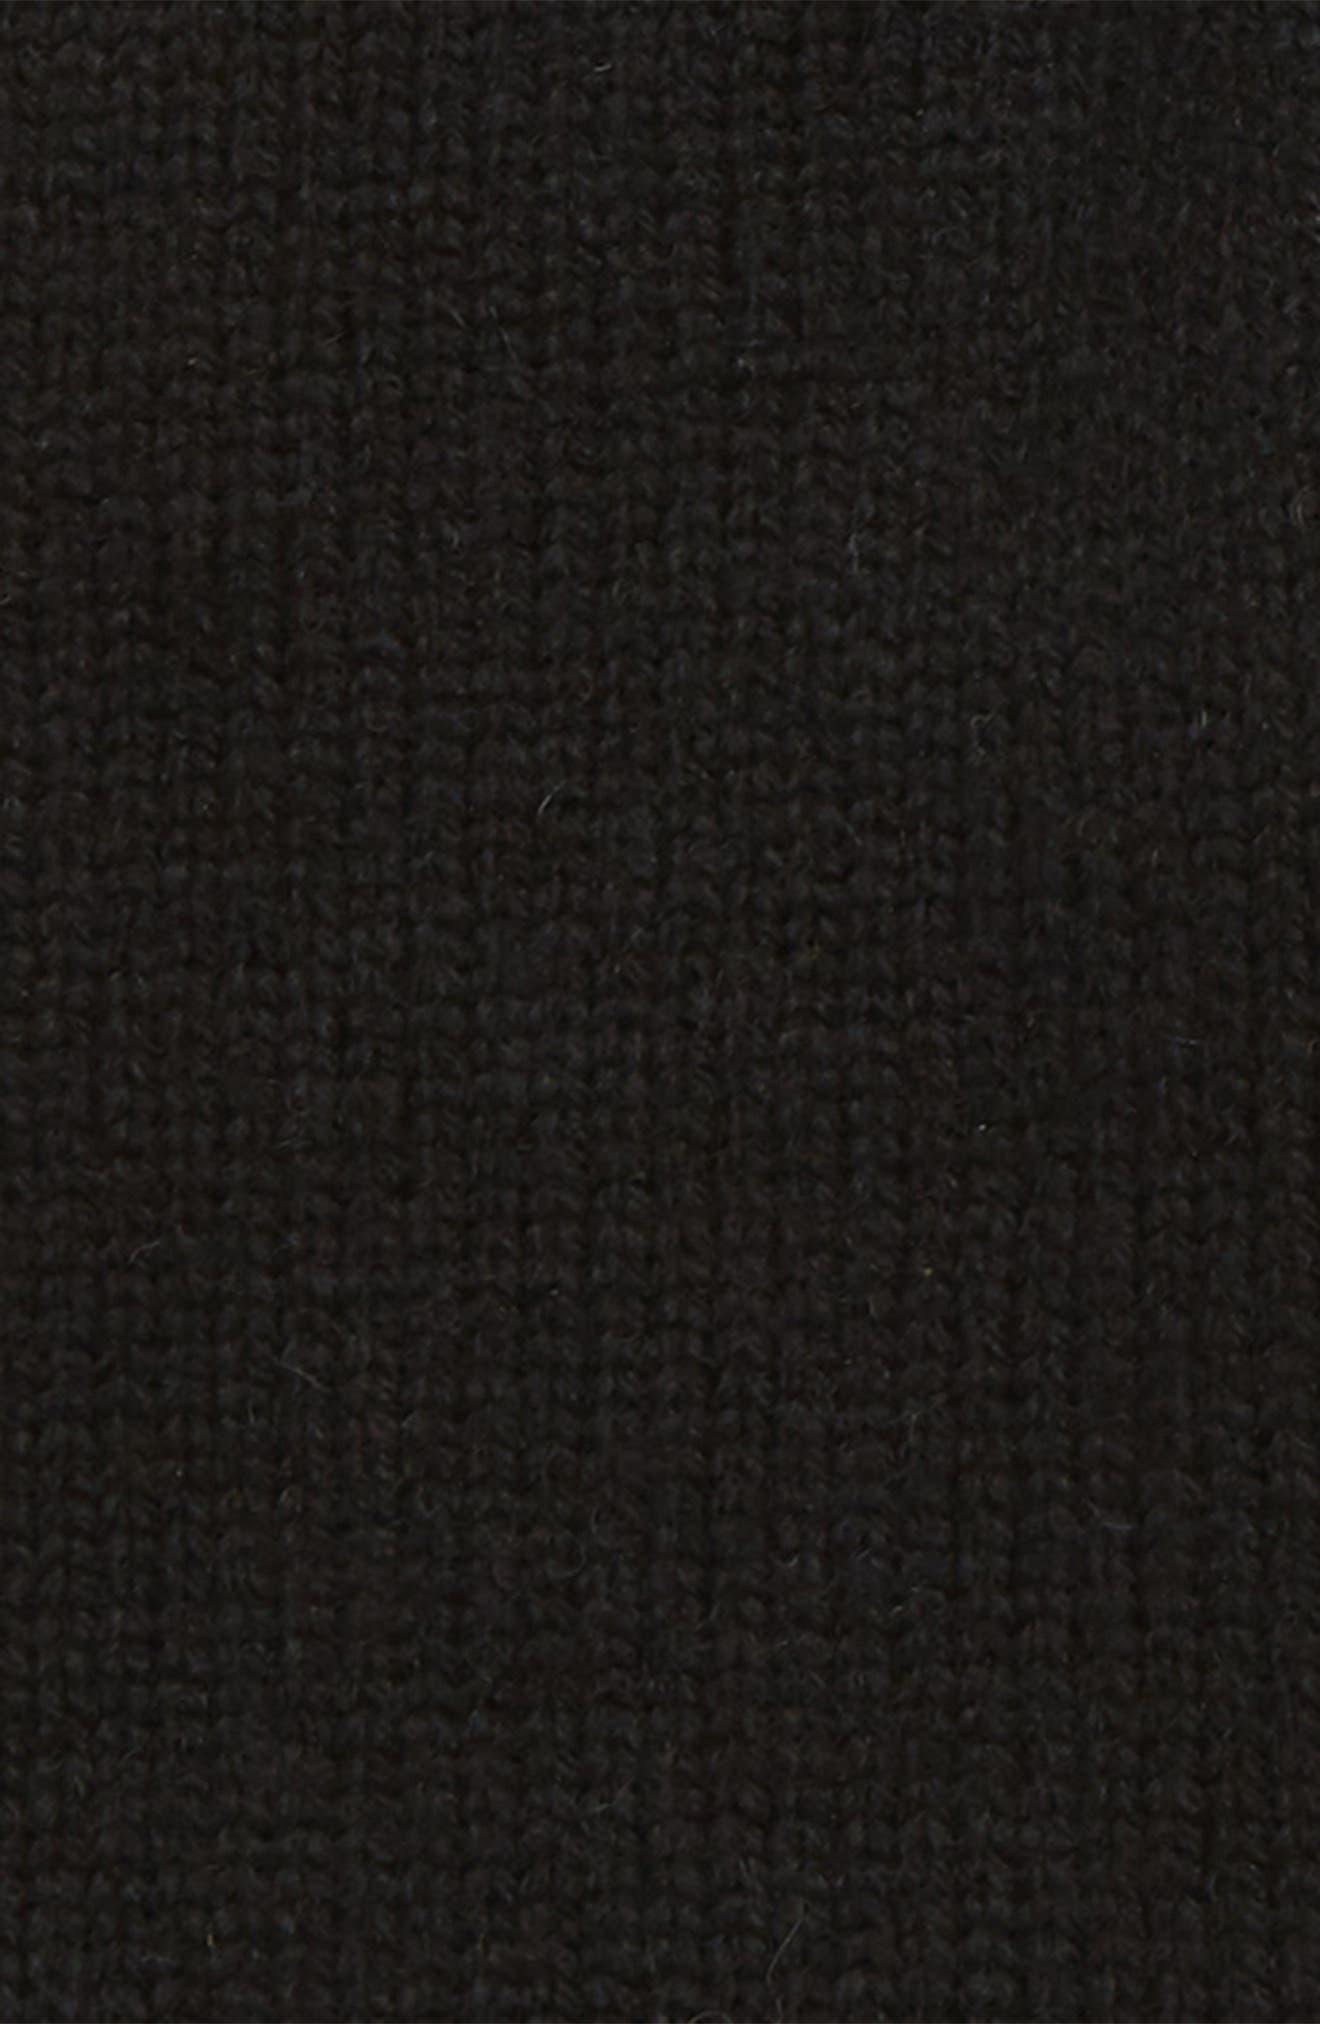 Leather Palm Knit Gloves,                             Alternate thumbnail 2, color,                             BLACK